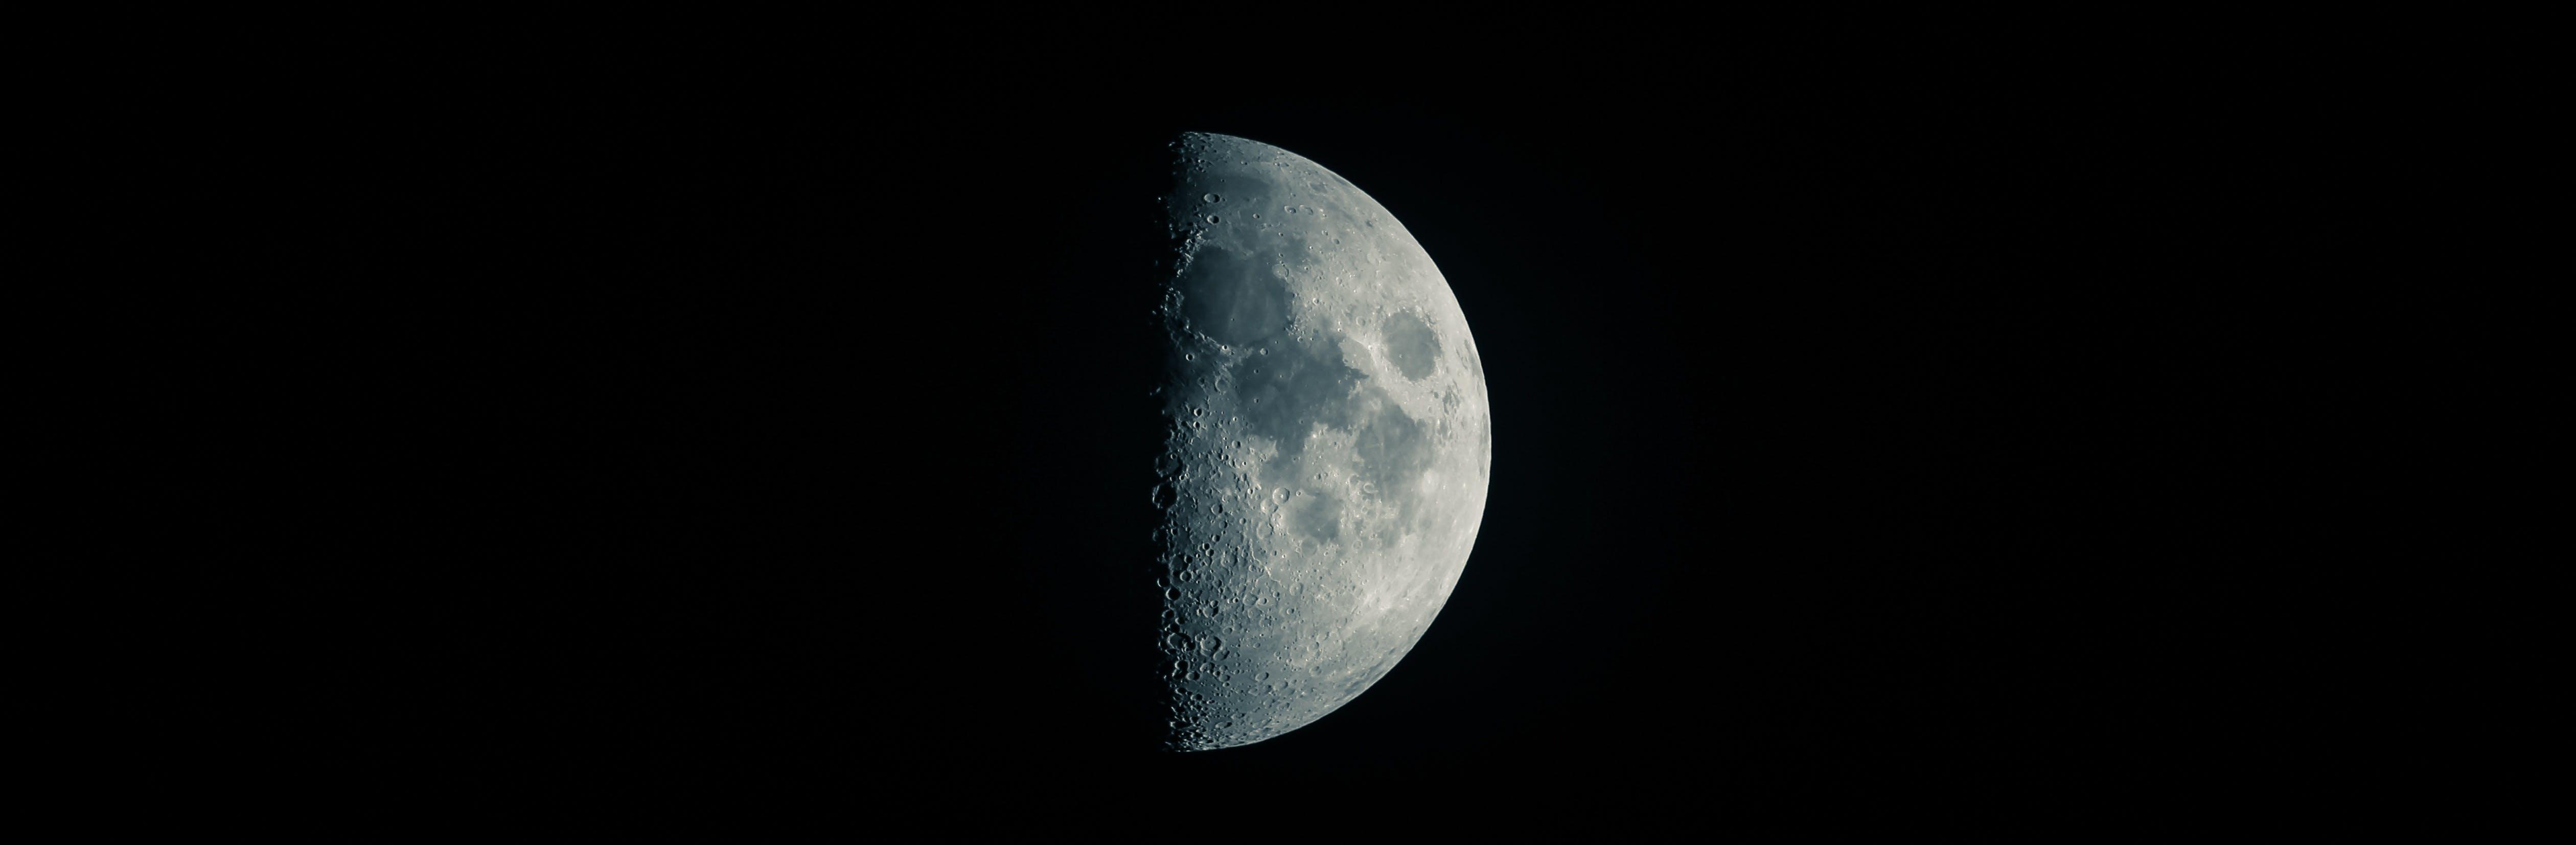 astronomy, crater, dark